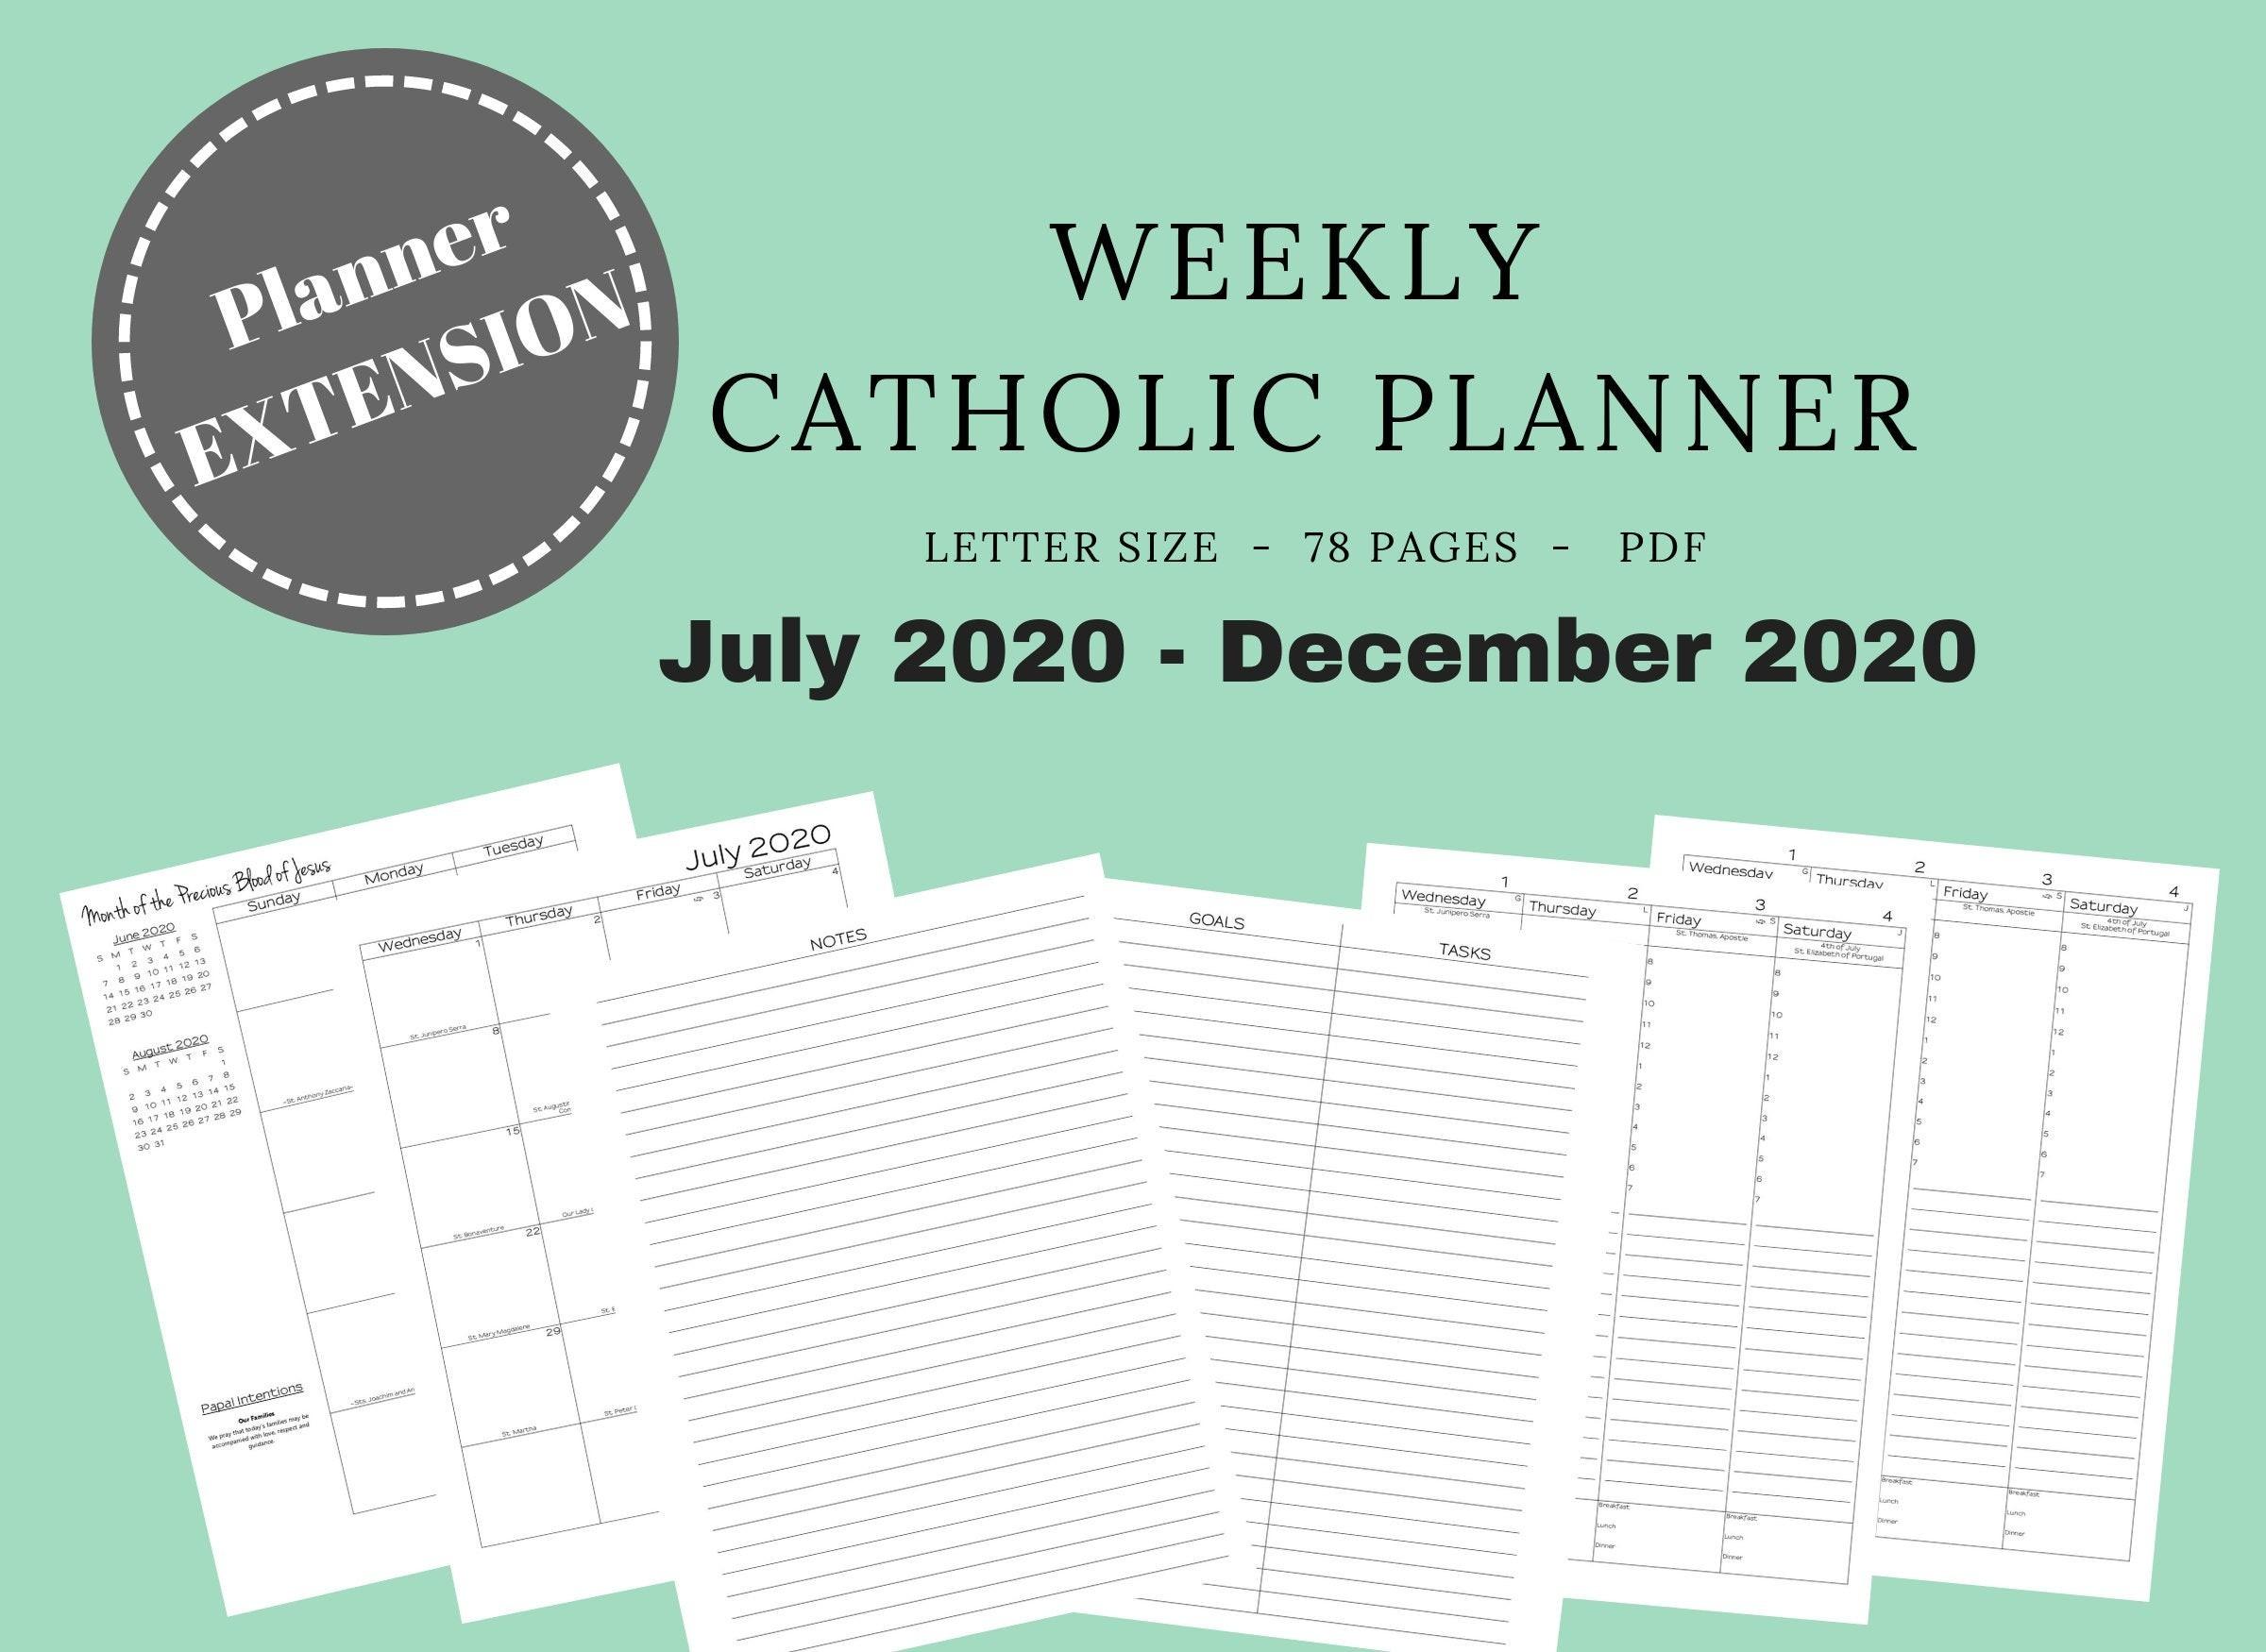 2020 Catholic Planner *extension* Weekly Printable: Daily Planner / Weekly  Calendar / Liturgical Planner / Printable Catholic Planner-2020 Catholic Monthly Calendar Printable